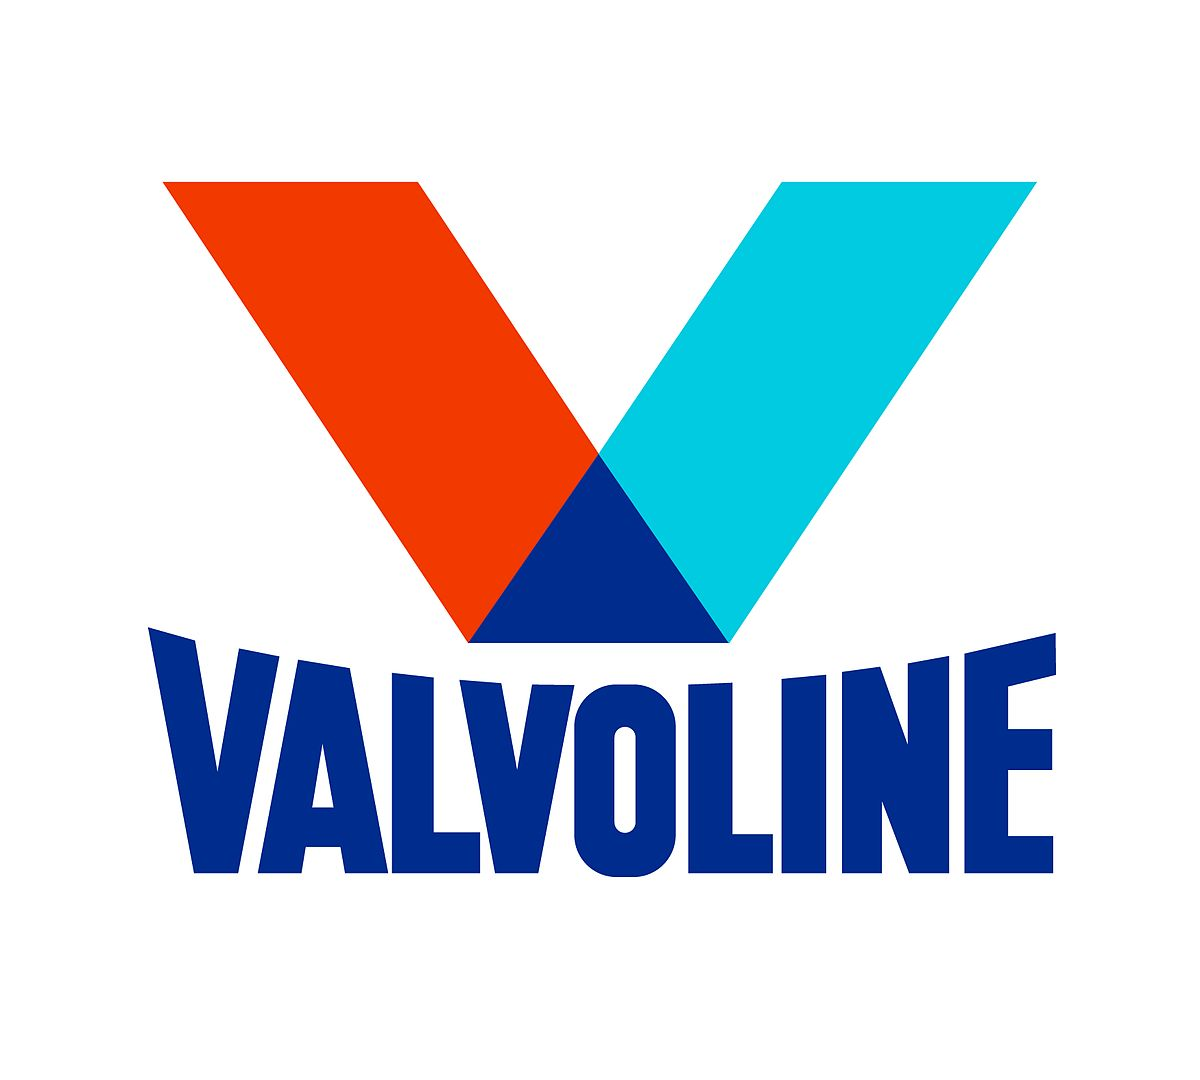 Oil Change Coupons >> Valvoline — Википедия